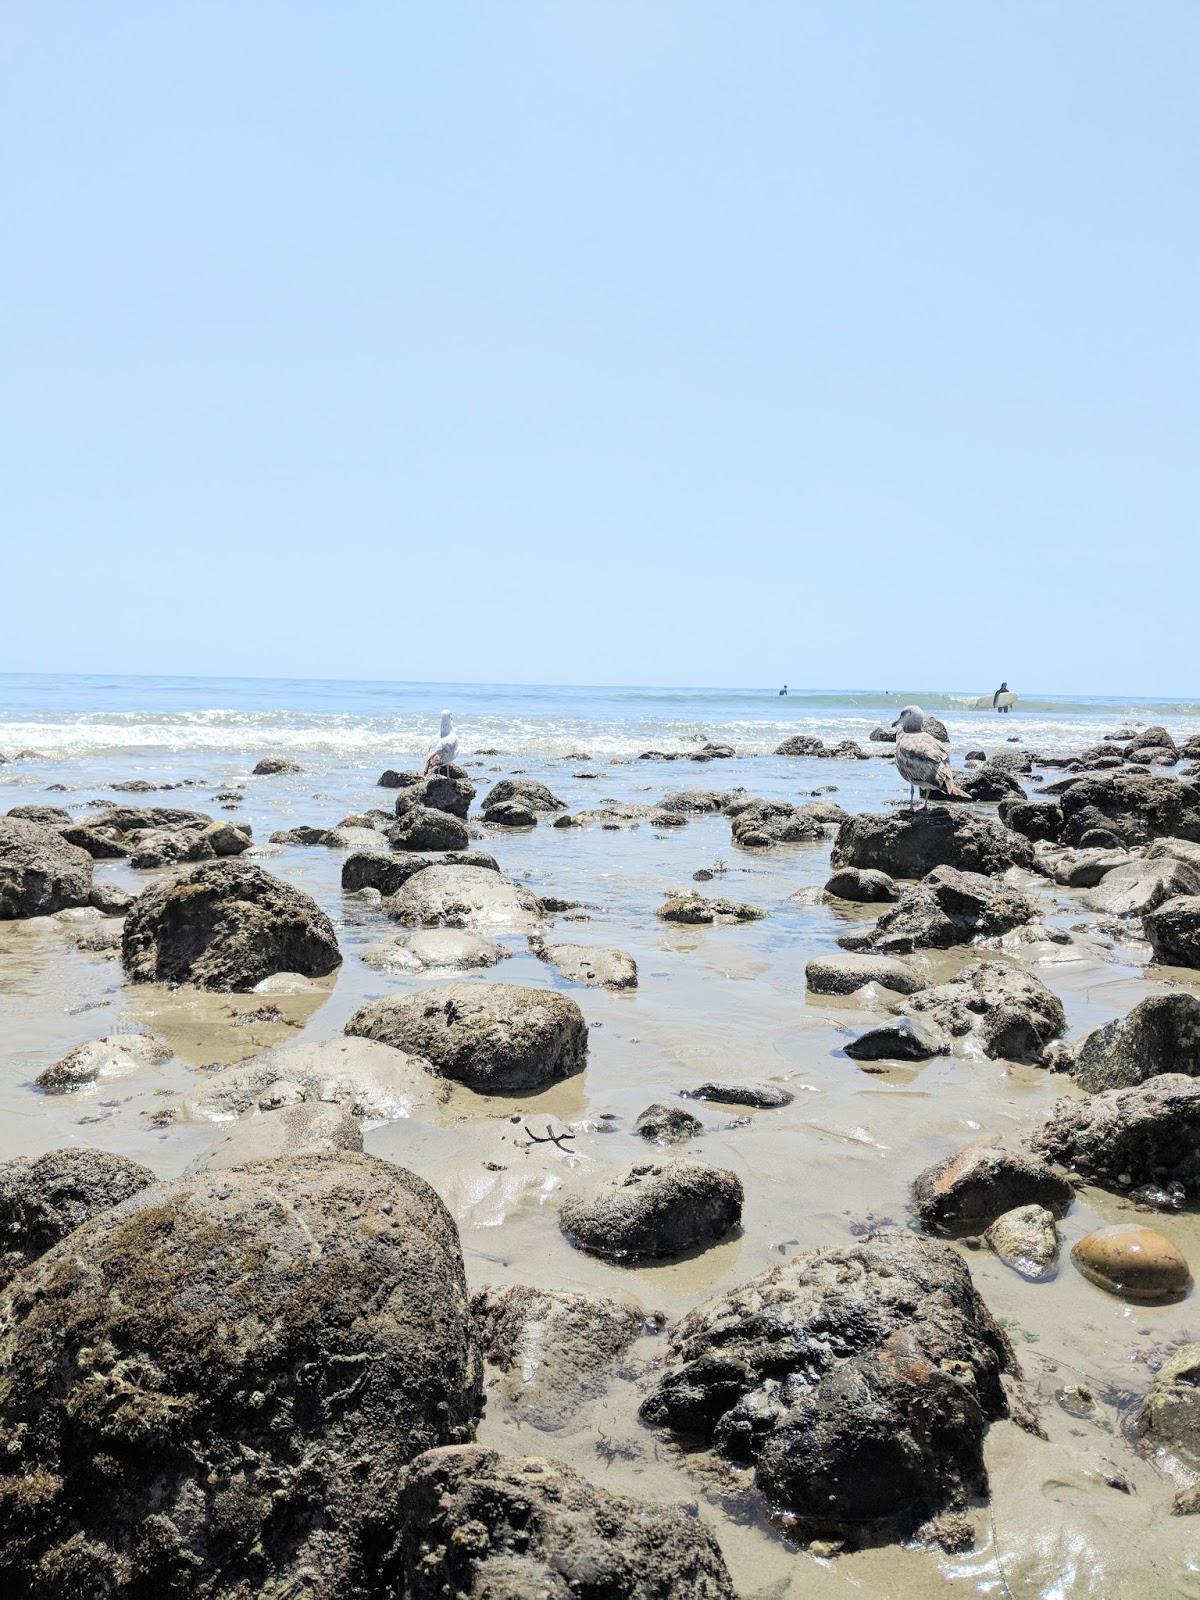 Topanga Beach Malibu Los Angeles California beach destinations tourist LA CA where to go what to do surf tide seagull topanga state park